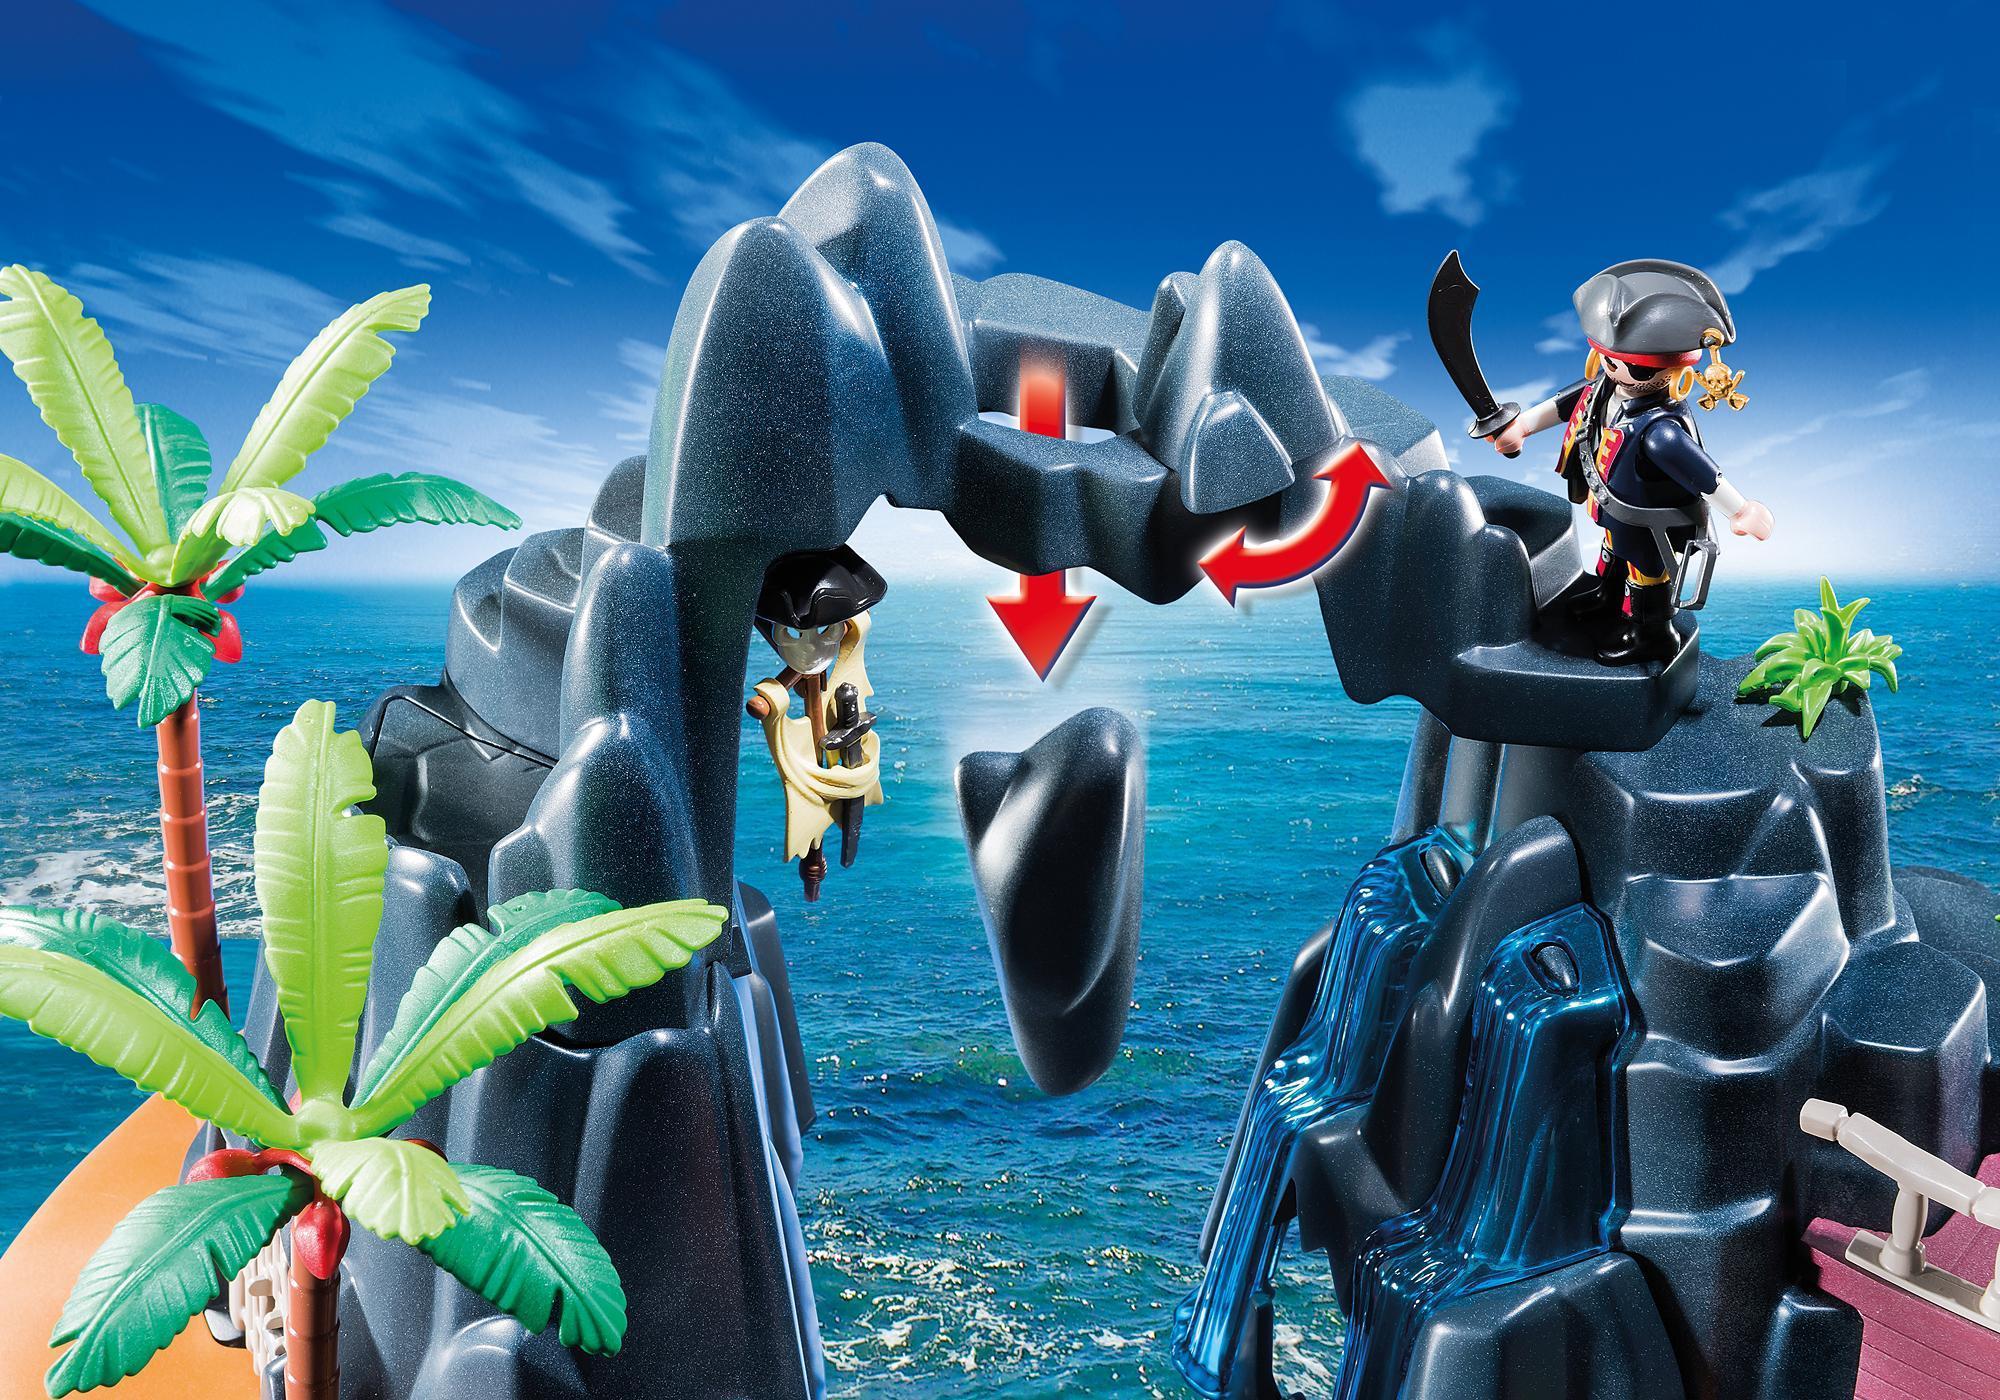 http://media.playmobil.com/i/playmobil/6679_product_extra5/Isola del tesoro fortificata